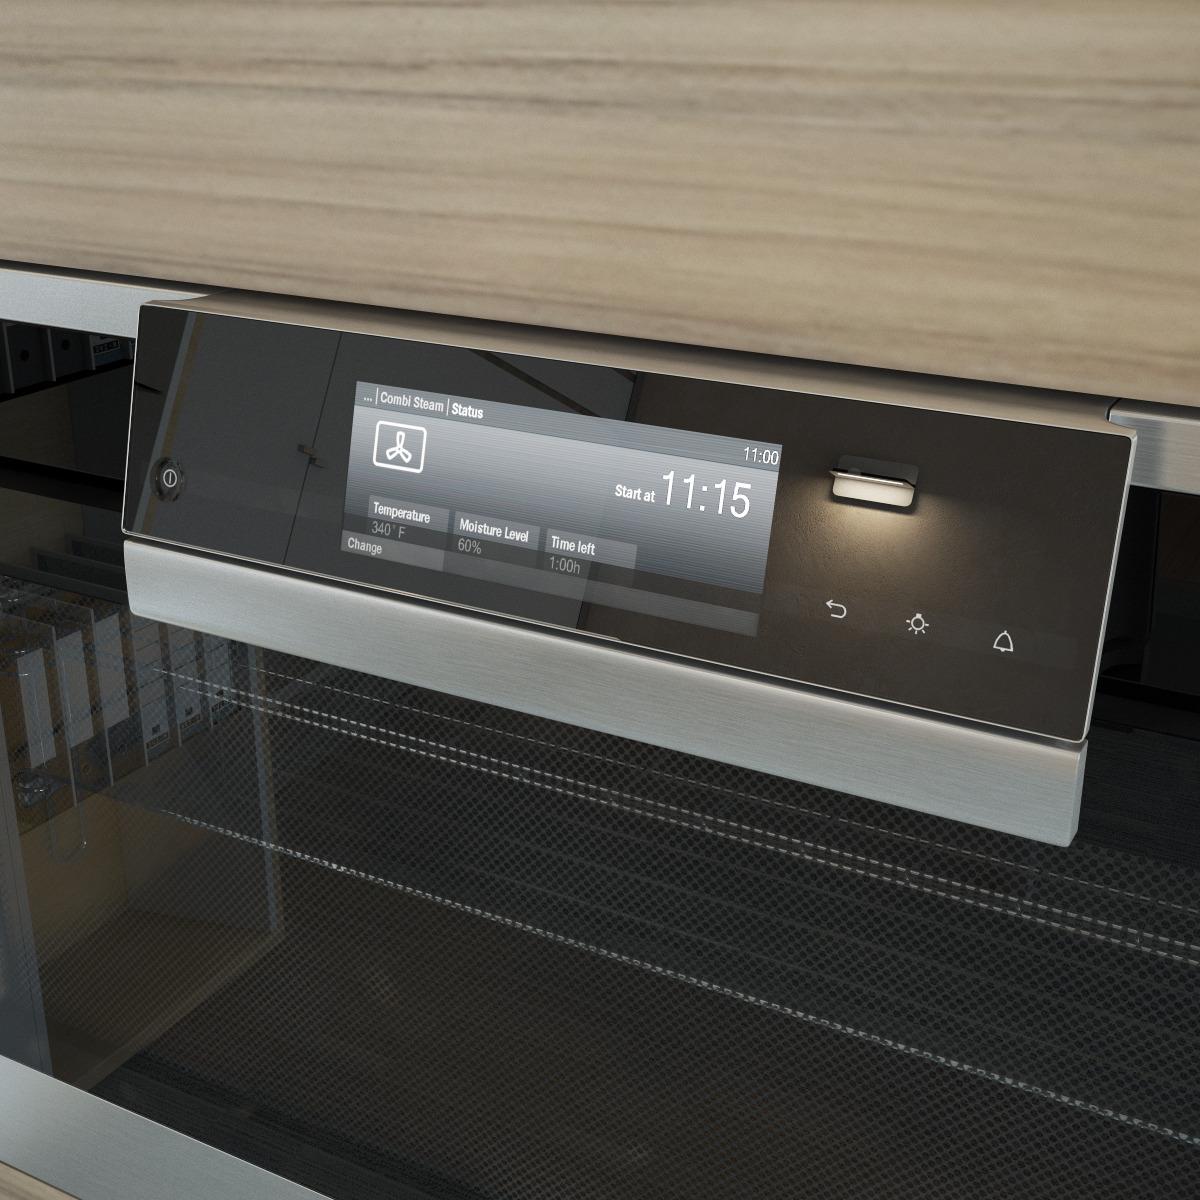 miele h6890bp oven 90 cm by genkot29 3docean. Black Bedroom Furniture Sets. Home Design Ideas